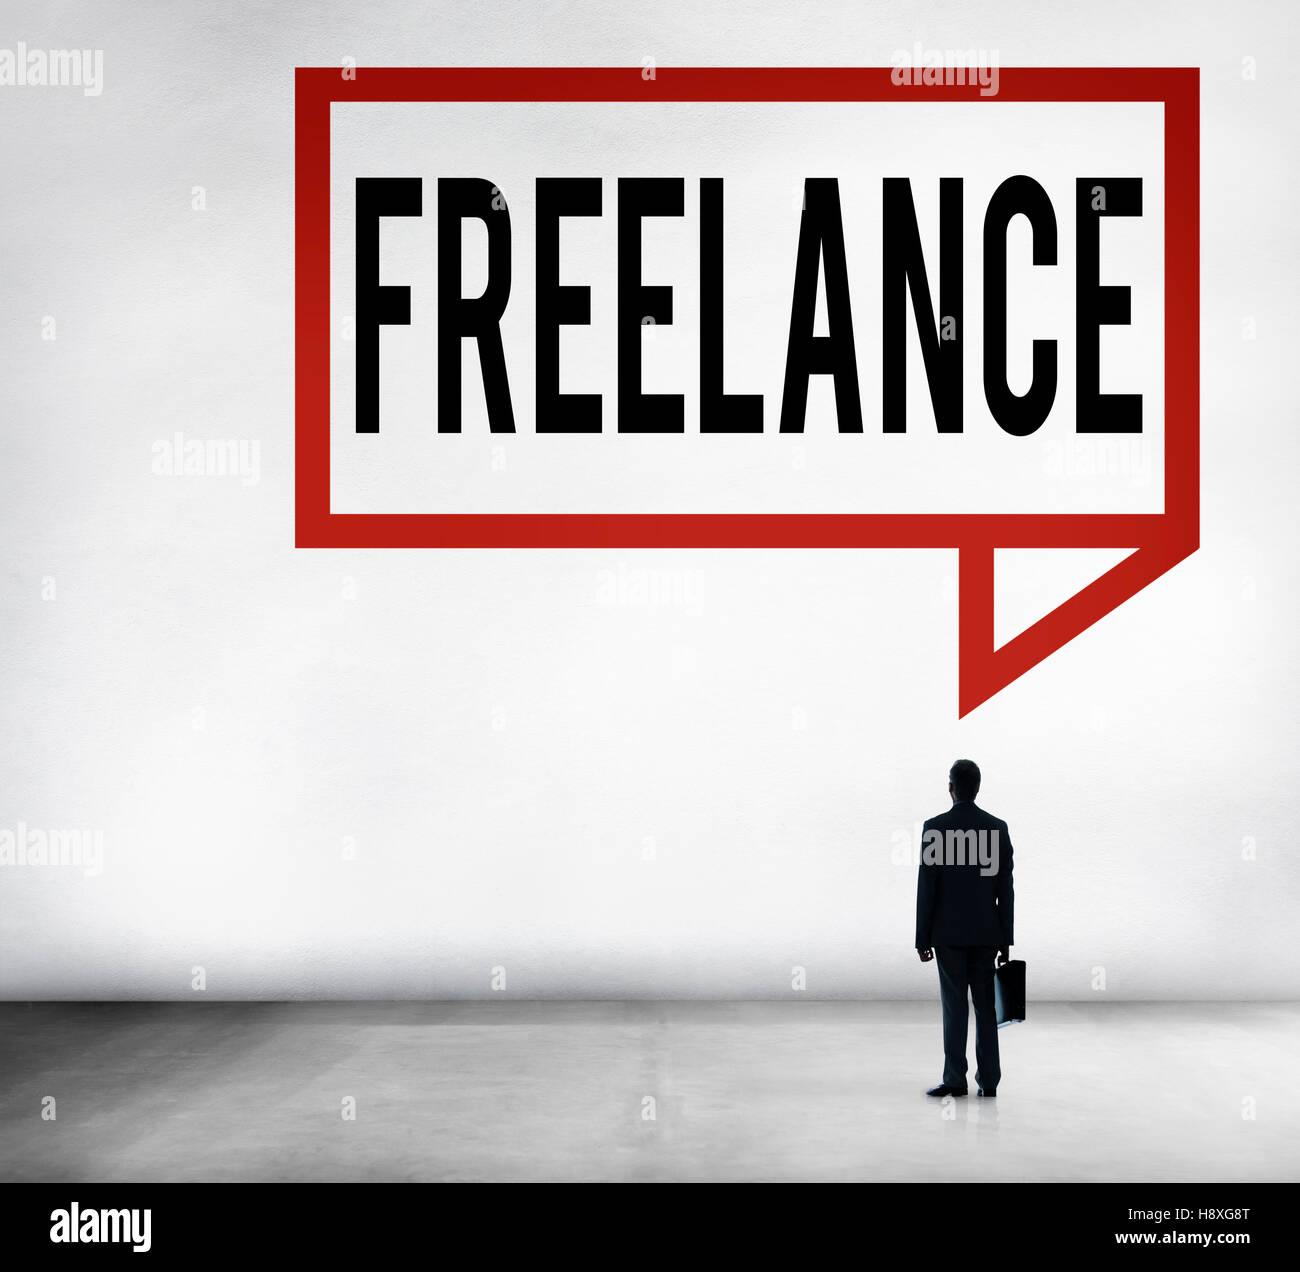 Freelance Part time Outsources Job Employment Concept - Stock Image